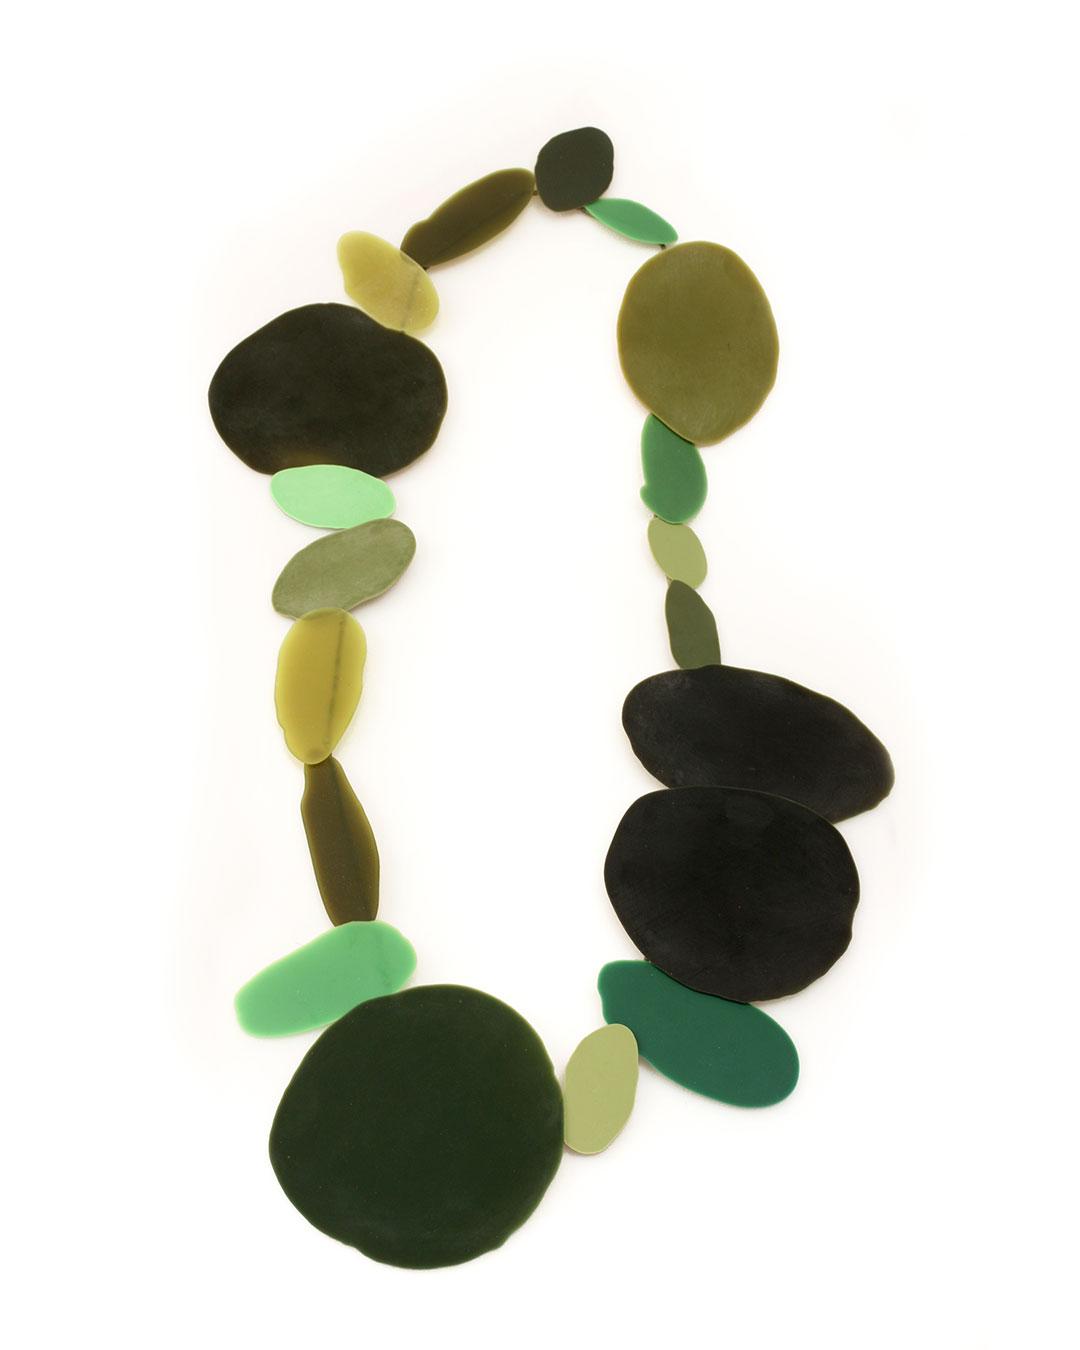 Ela Bauer, necklace, 2020, resin, pigment, jade, 700 x 400 x 15 mm, €1250